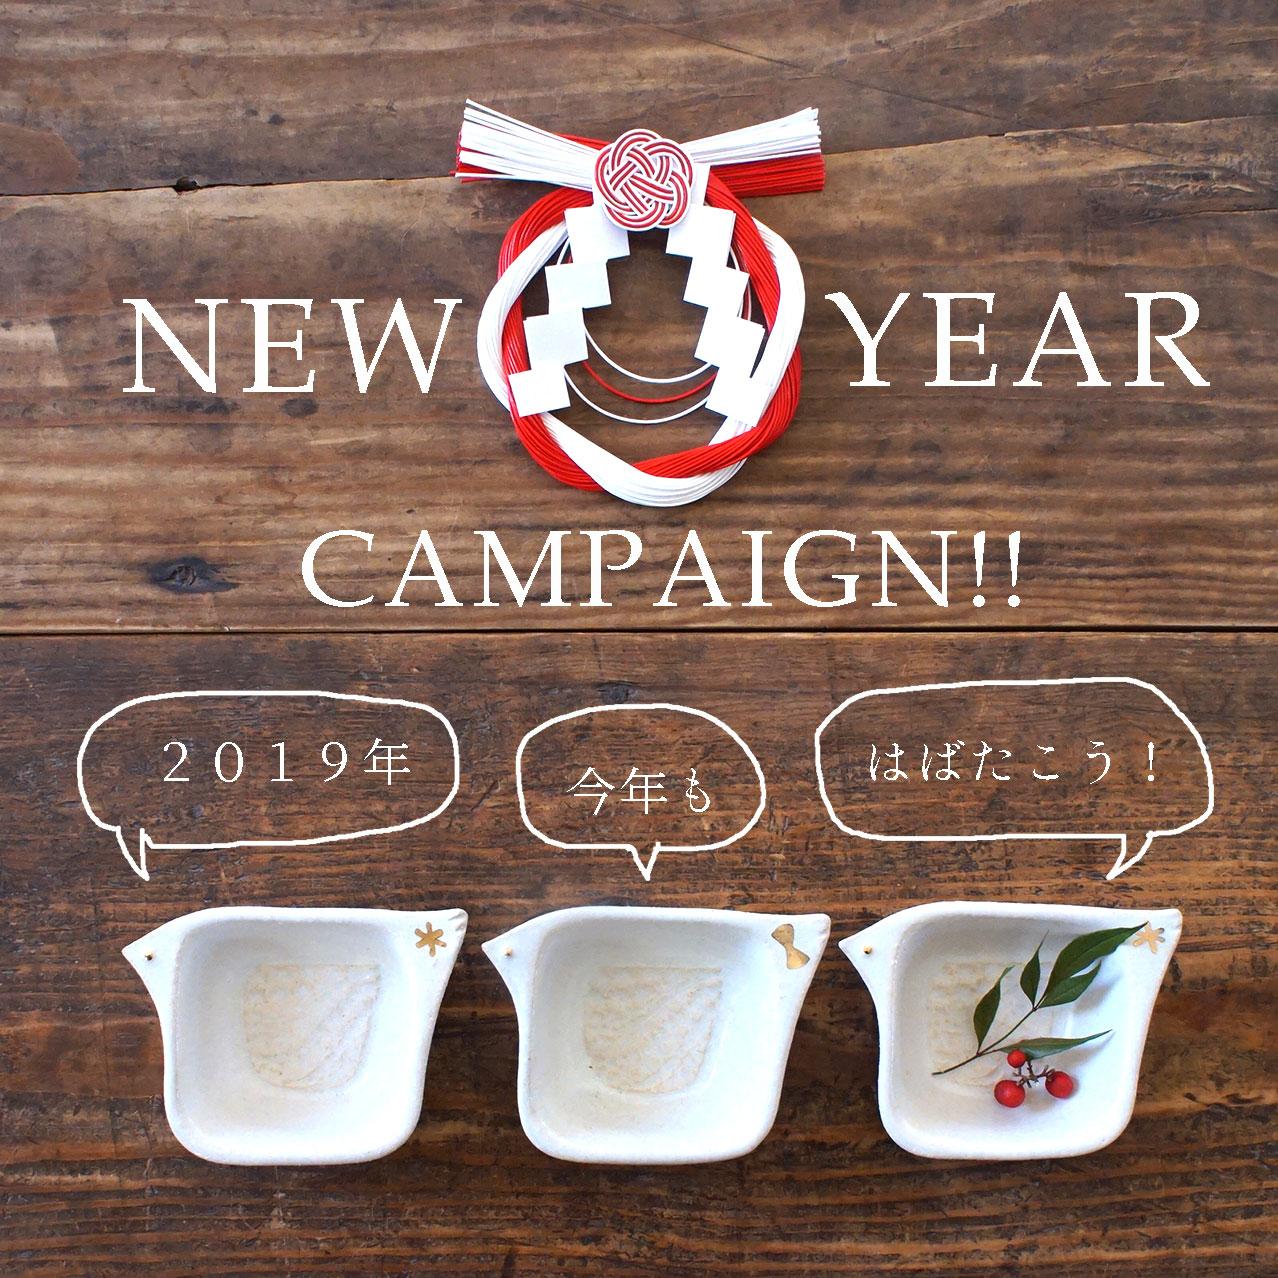 NEW YEARキャンペーンのお知らせです☆